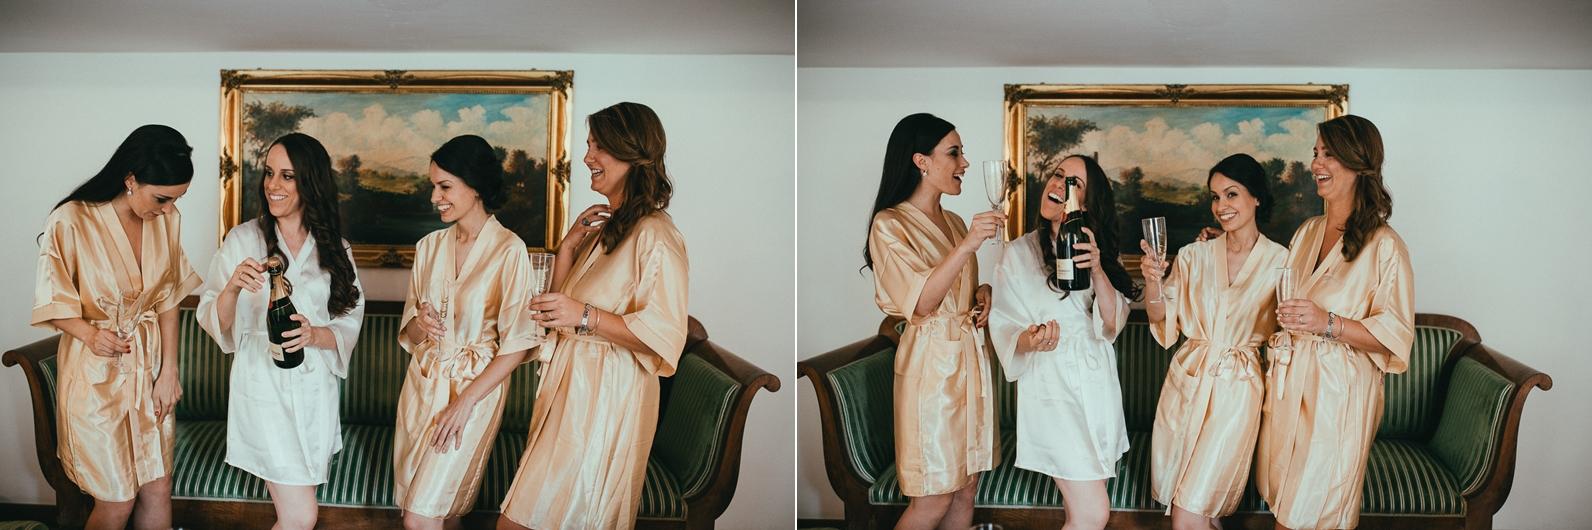 badia-orvieto-wedding-photographer (25).jpg